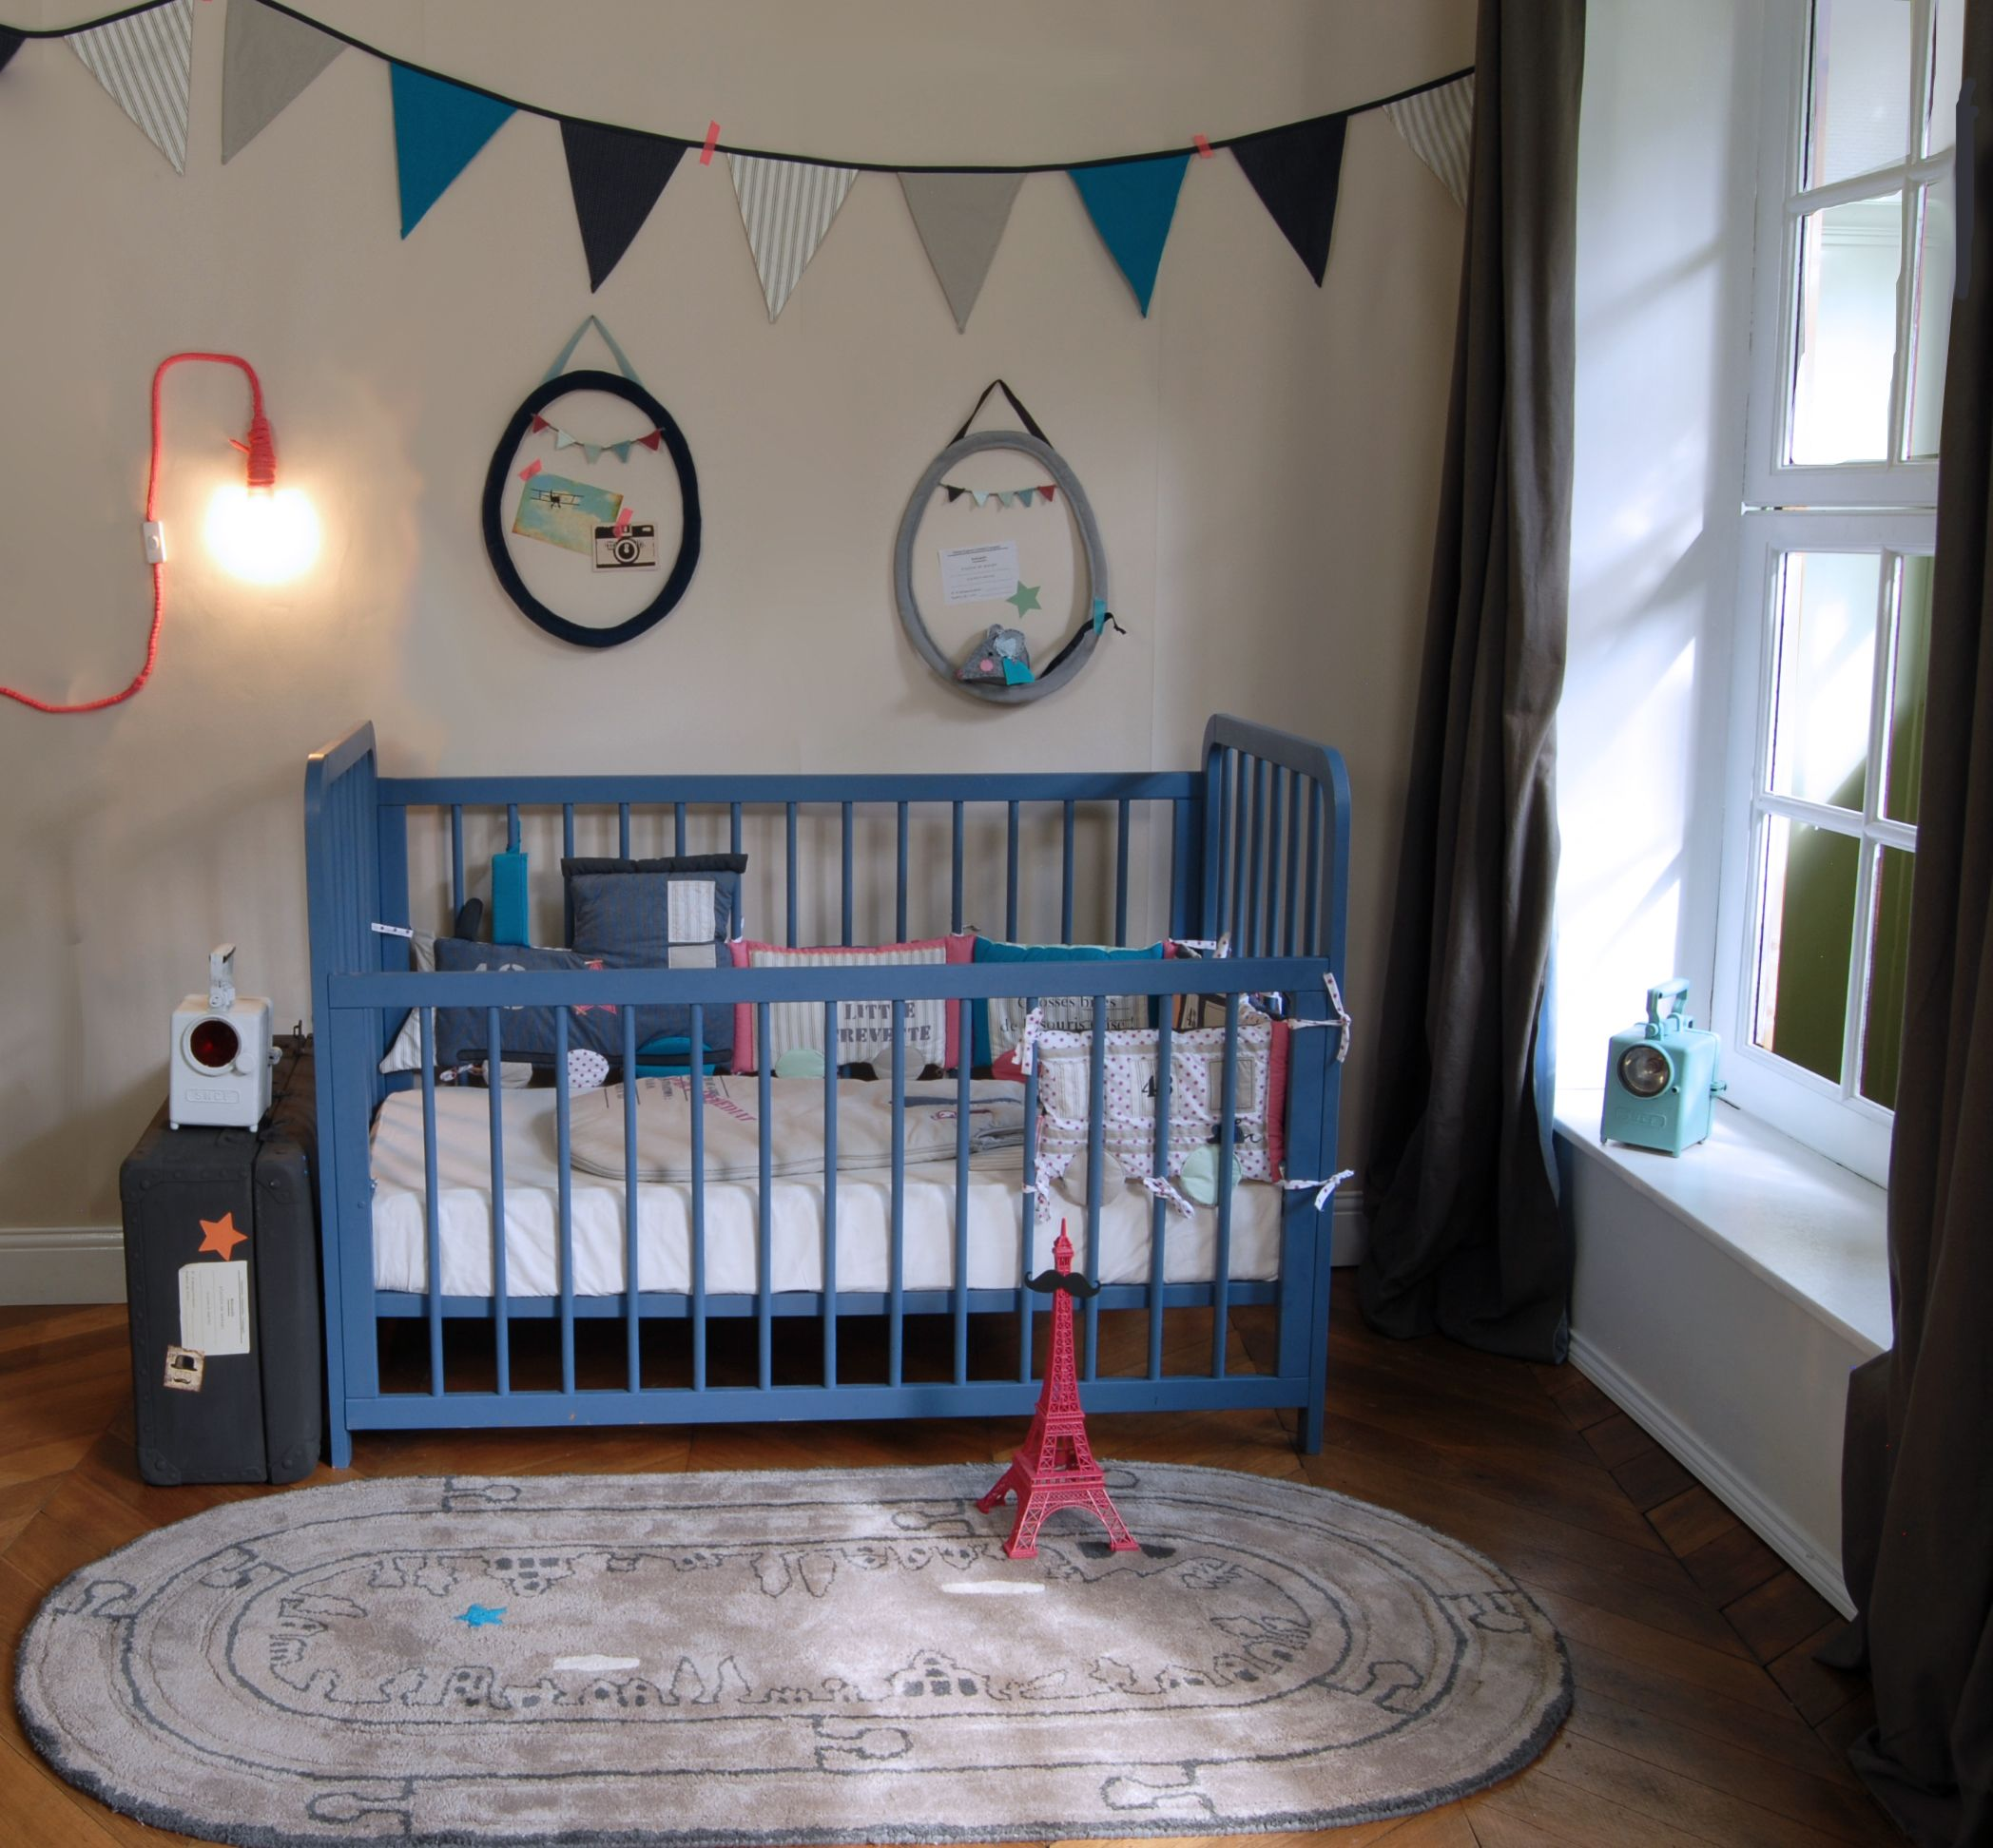 Ambiance Chambre Bébé Garçon ambiance de chambre bébé garçon train mini-express chez www.little